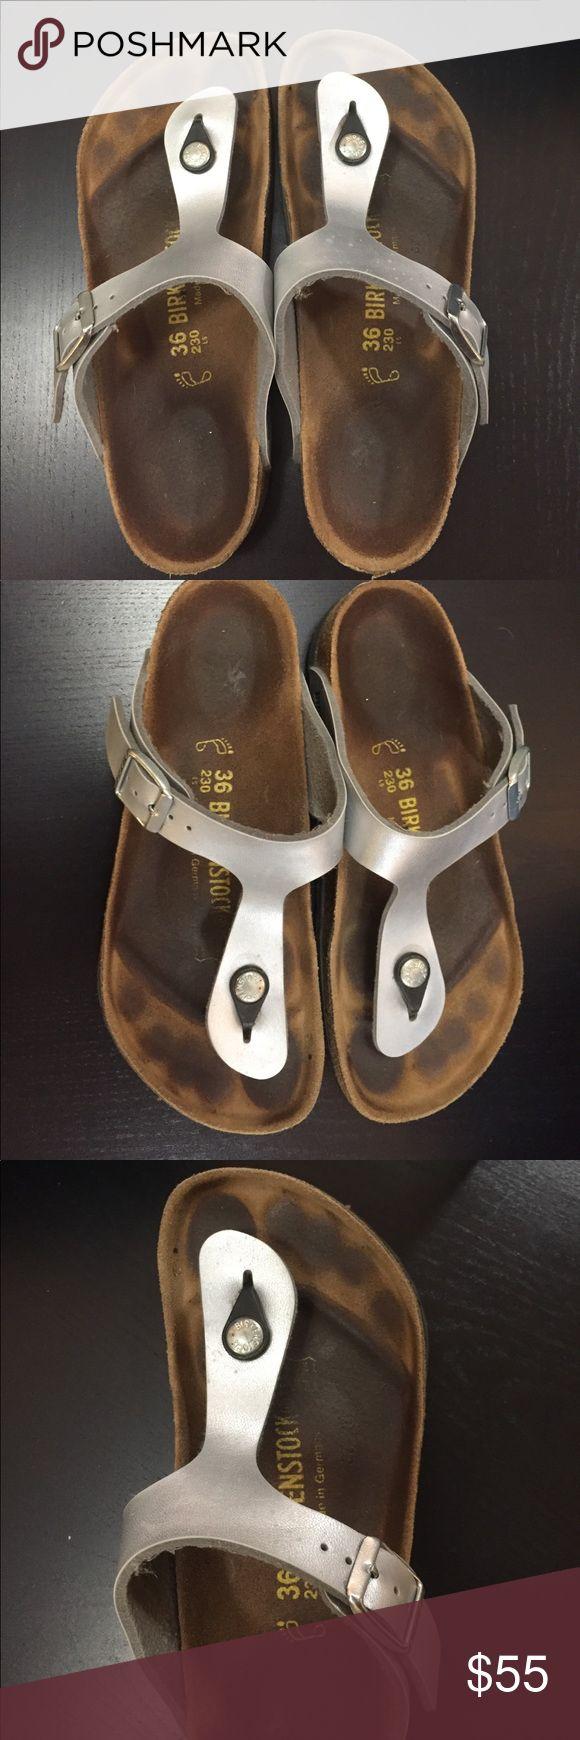 Gently worn Birkenstock Gizeh Sandal Very gently used Birkenstock Gizeh sandals in silver. Very comfy and versatile, perfect for summer. Birkenstock Shoes Sandals